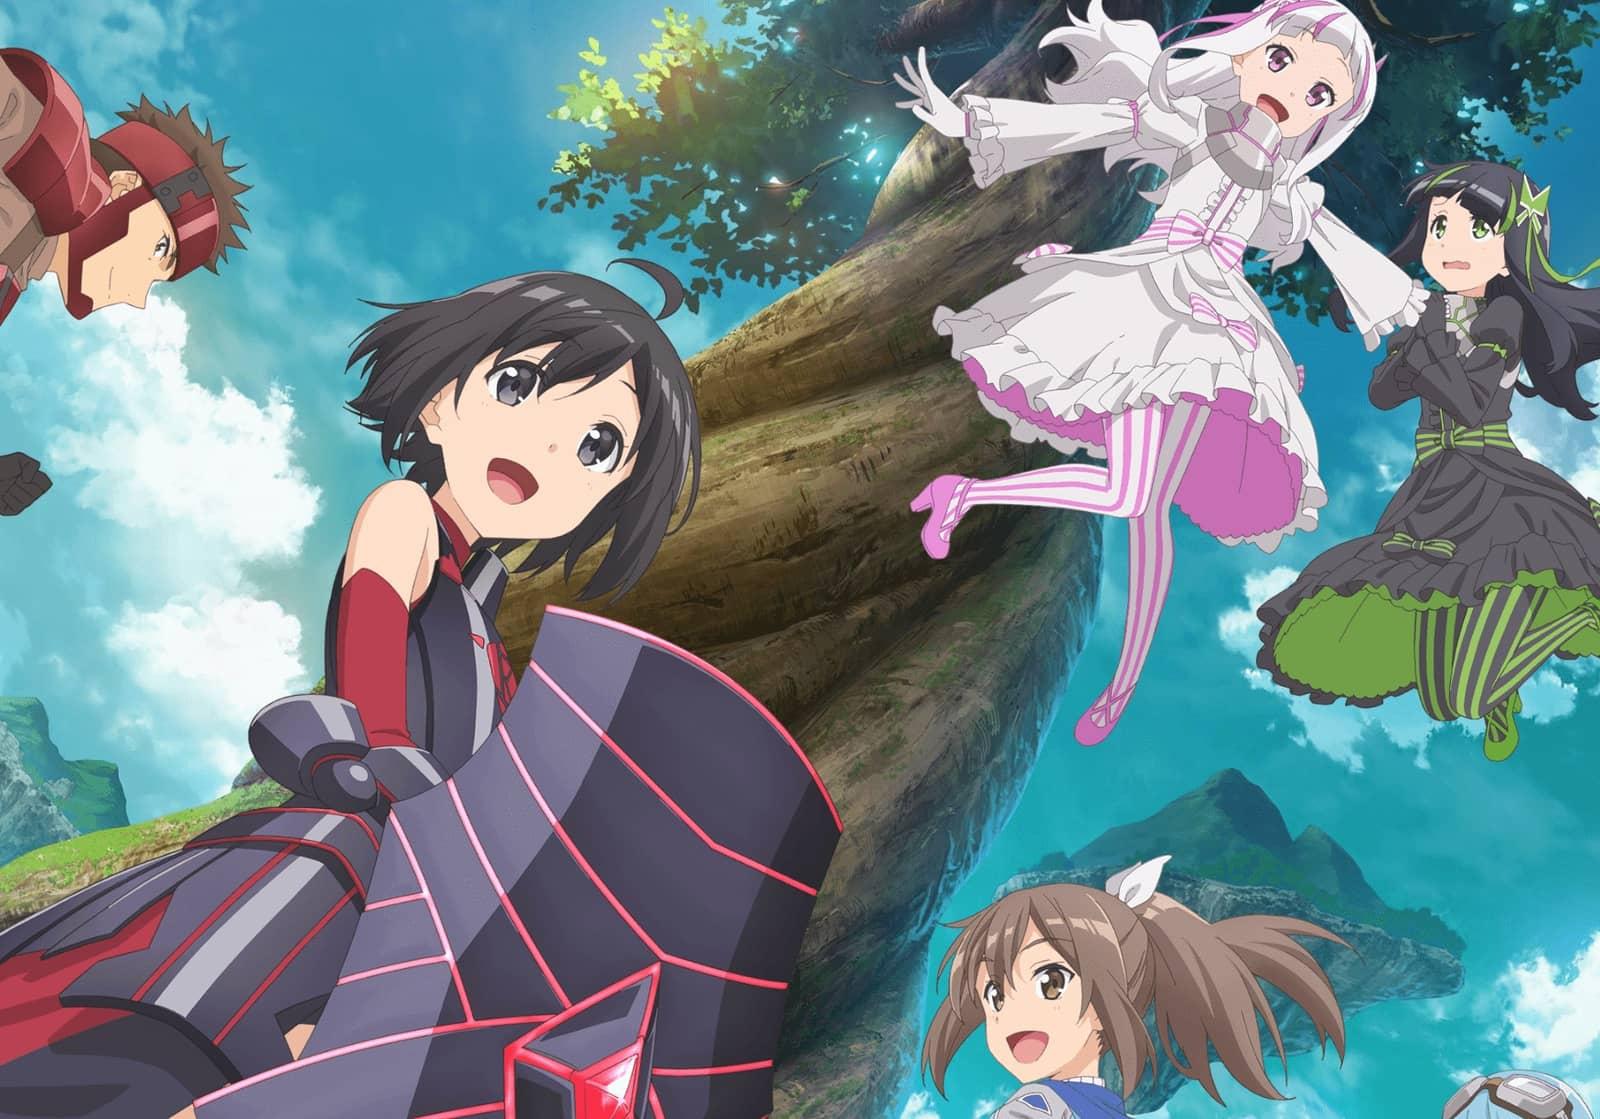 Best New Anime 9 (Spring, Summer, Autumn) - Japan Web Magazine